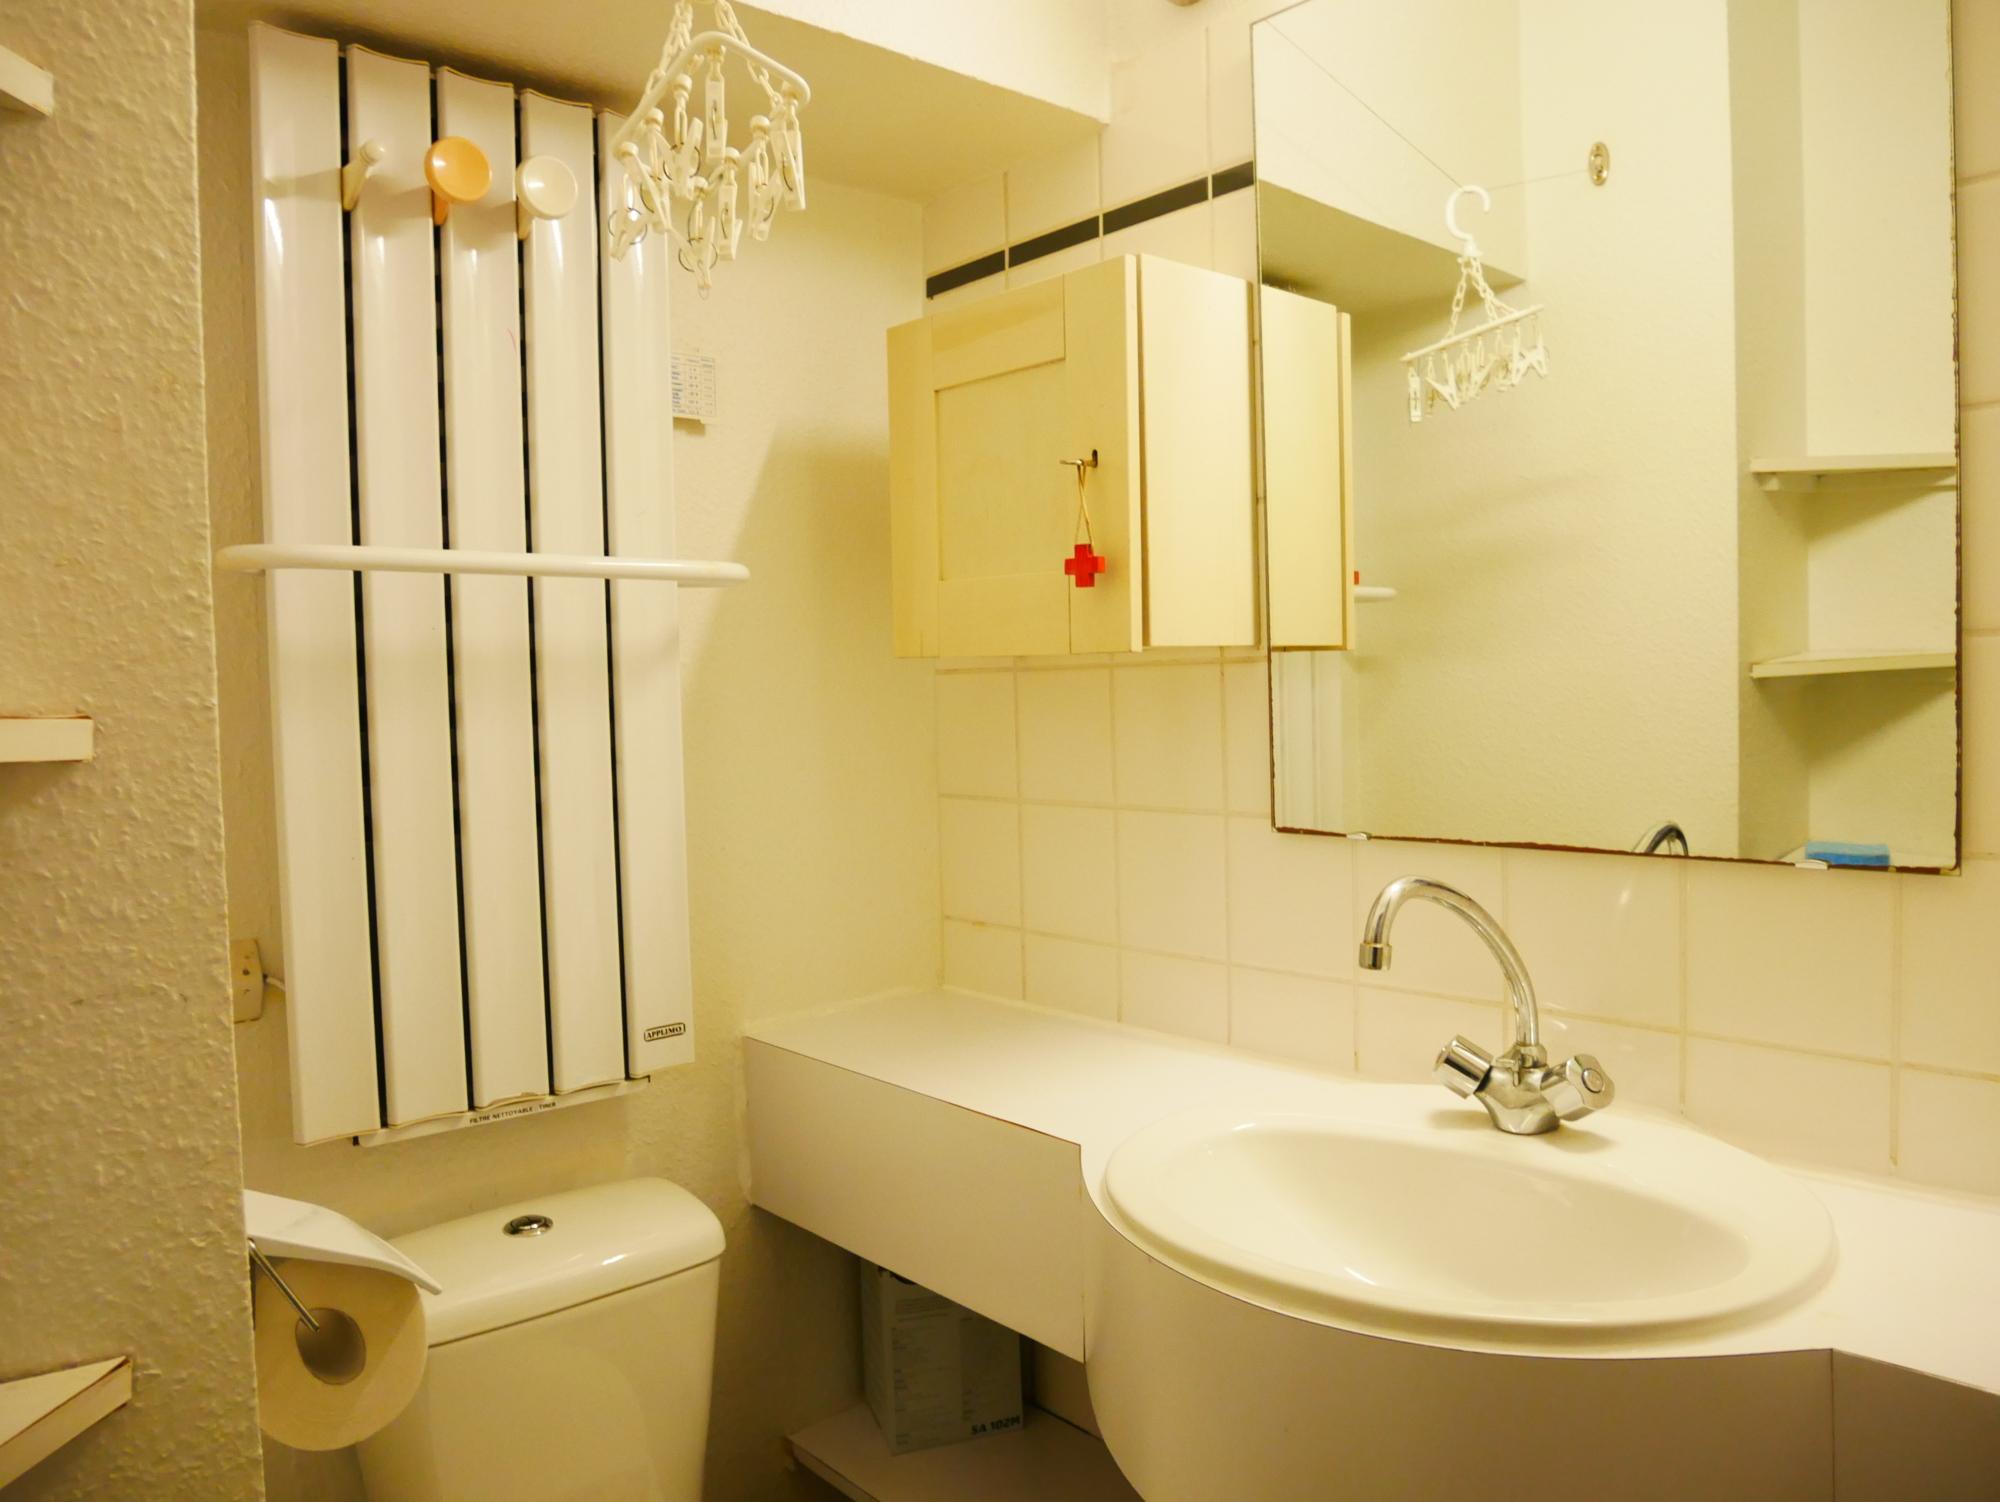 [Tiny] Chambre meublée - Av. des Vosges / rue Sellenick - nos locations - Beausite Immobilier 5